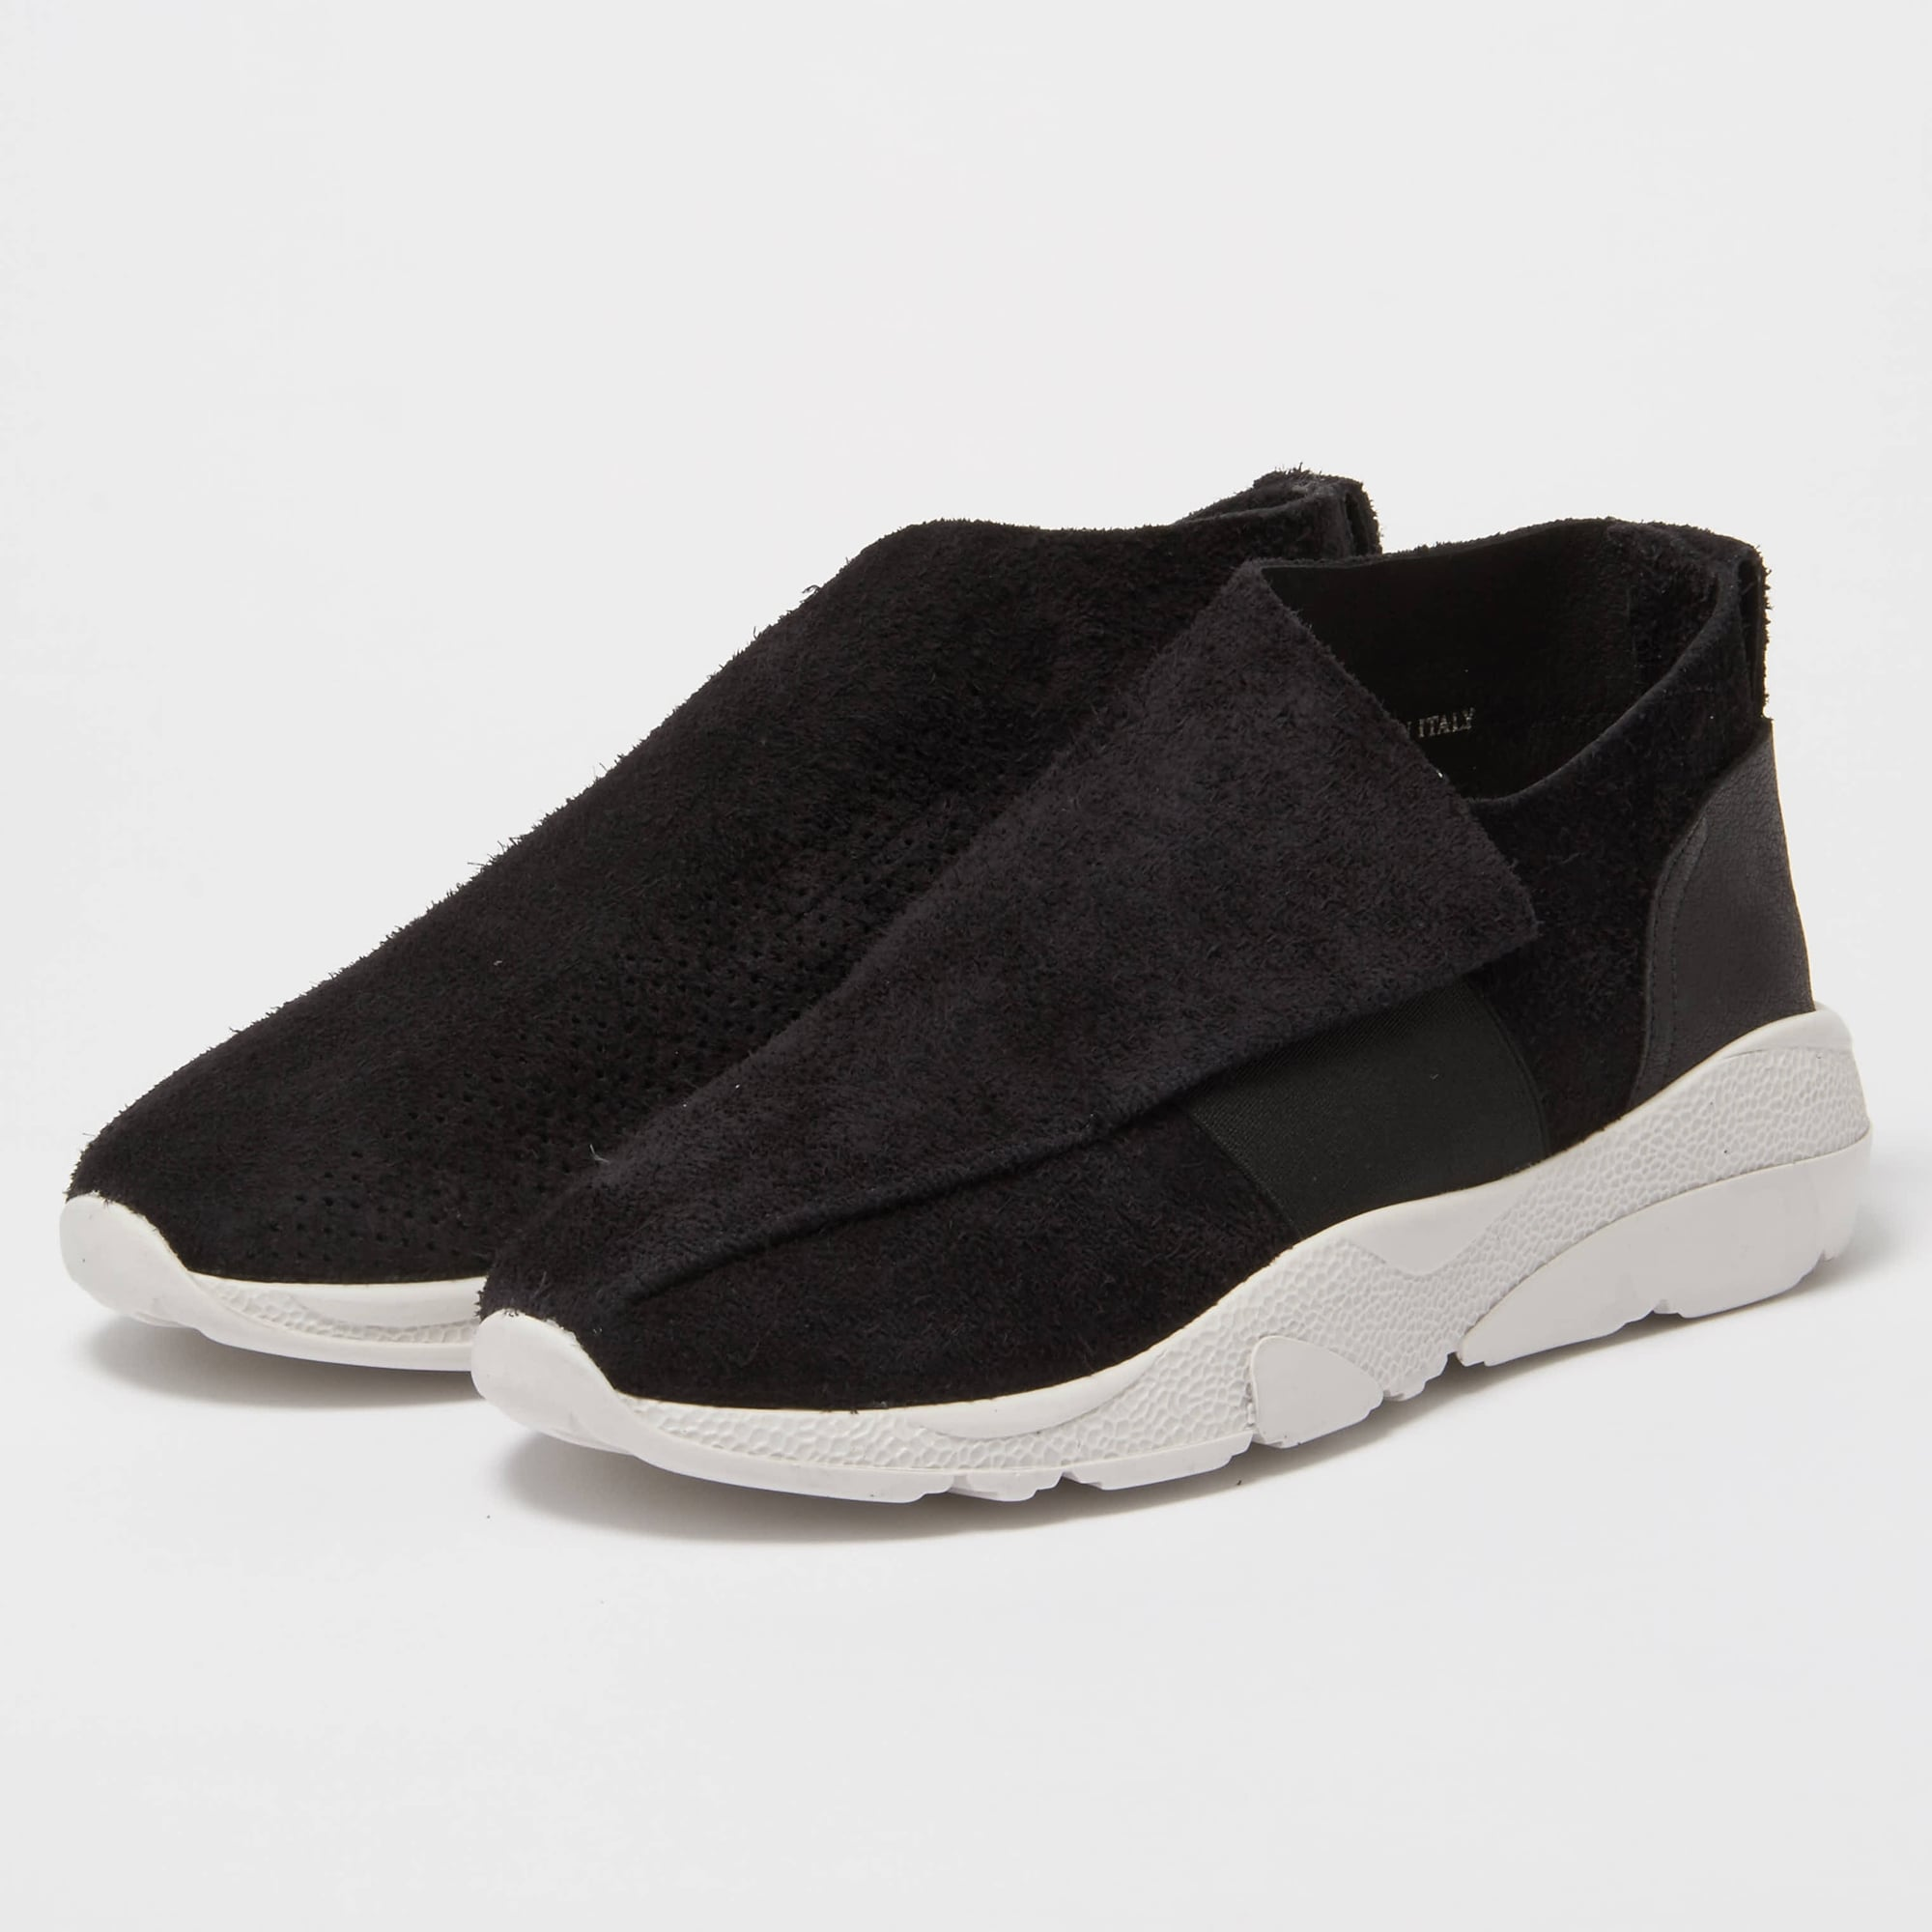 20f9b50d261 Casbia Vetta Reversed Buffalo Black Shoes 7503